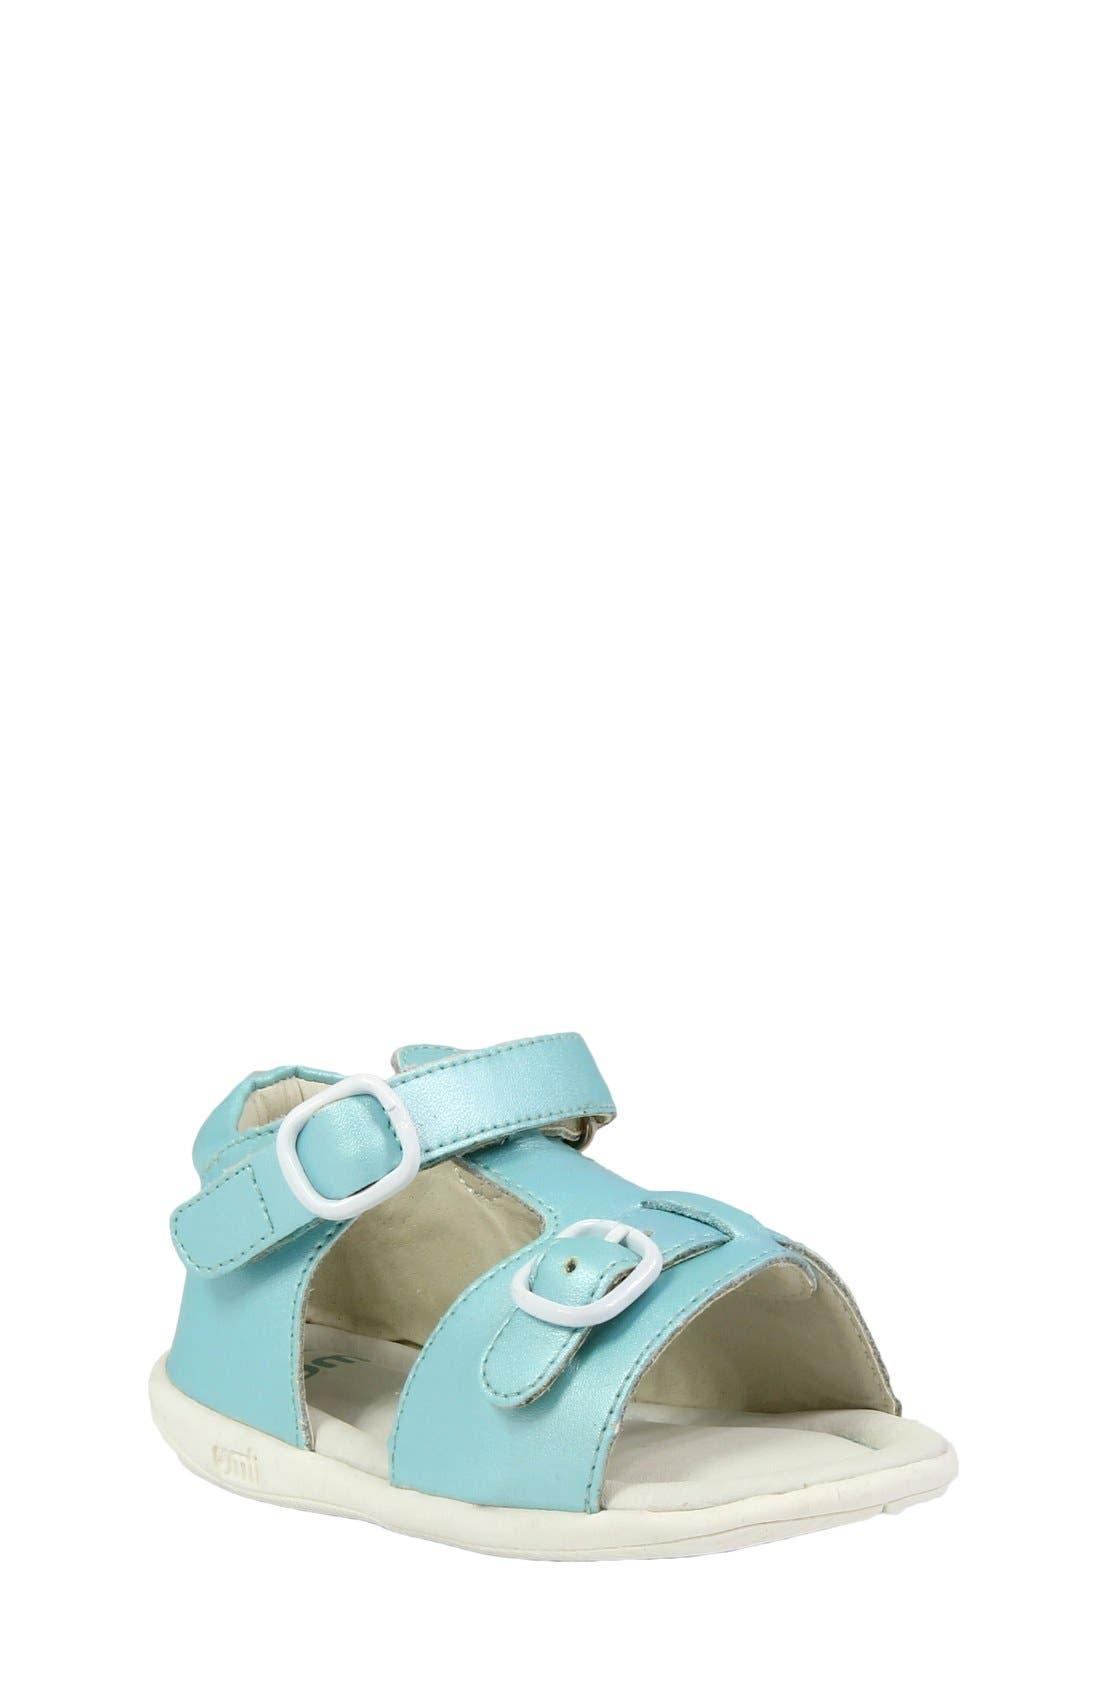 Main Image - Umi 'Noel' Sandal (Baby, Walker & Toddler)